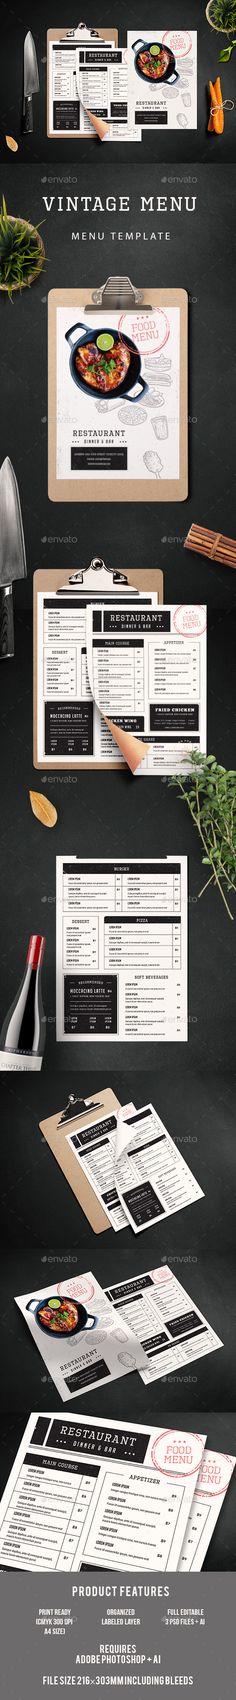 Vintage Menu — Photoshop PSD #bistro #burger menu • Download ➝ https://graphicriver.net/item/vintage-menu/19198851?ref=pxcr